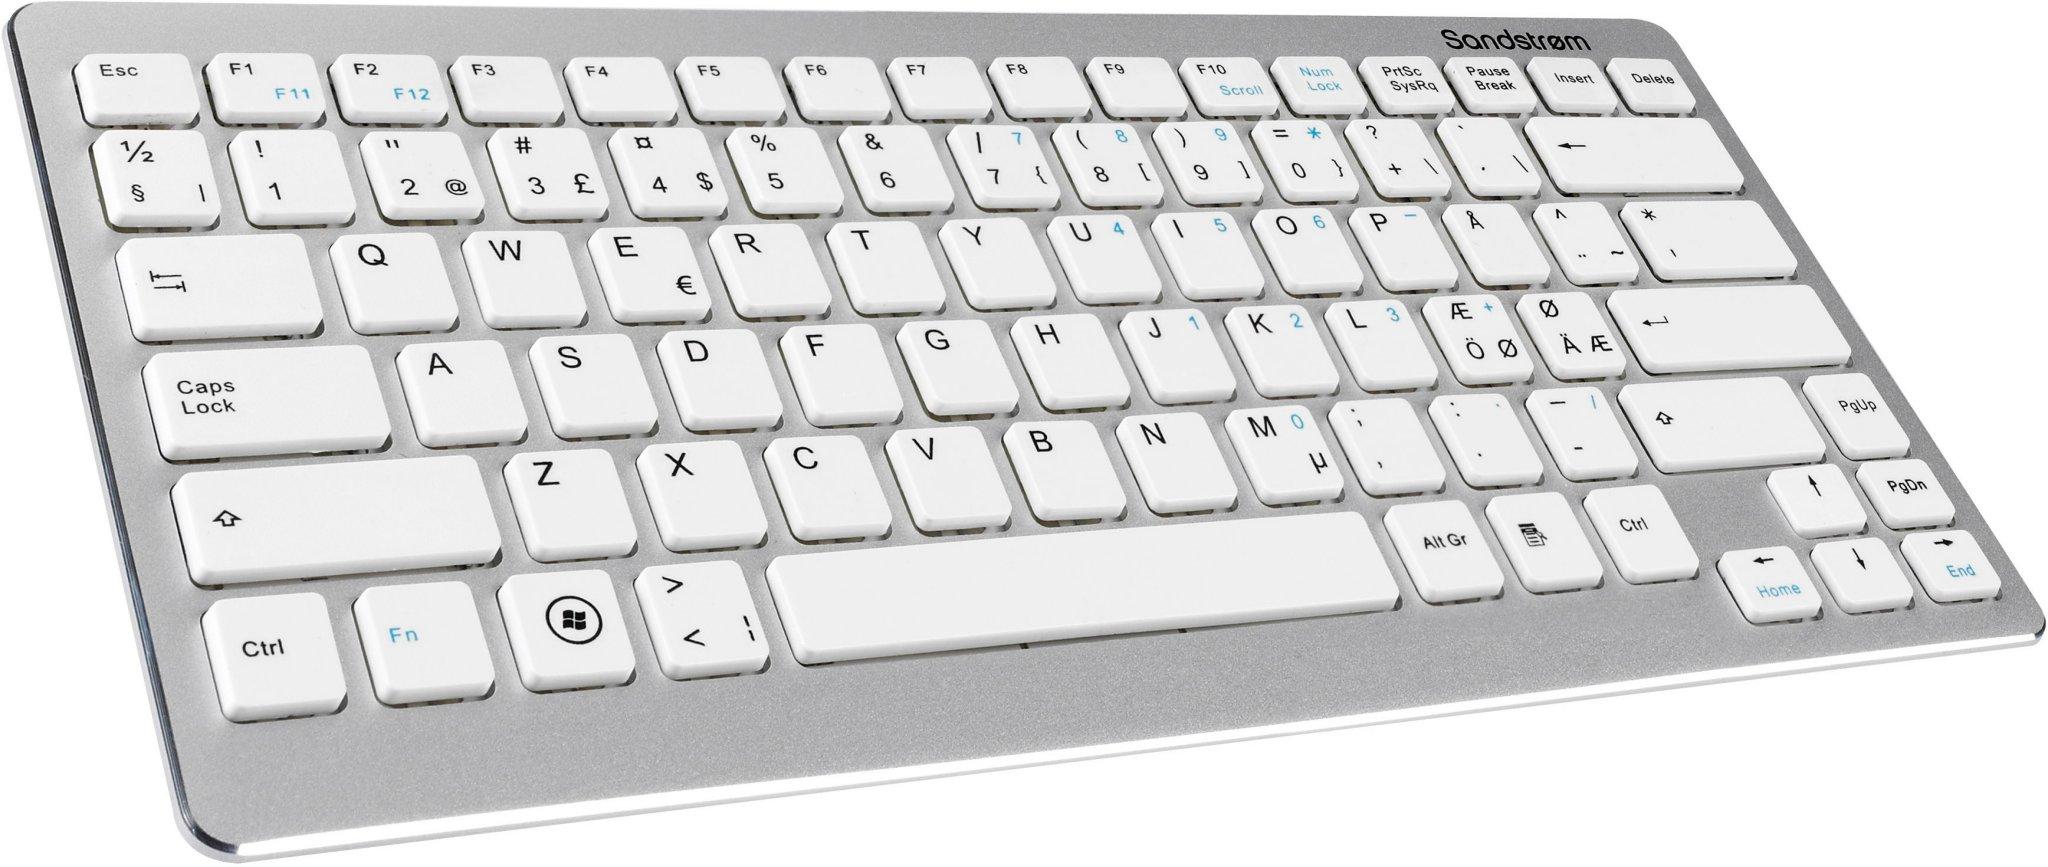 Sandstrøm Bluetooth trådløst tastatur   FINN.no